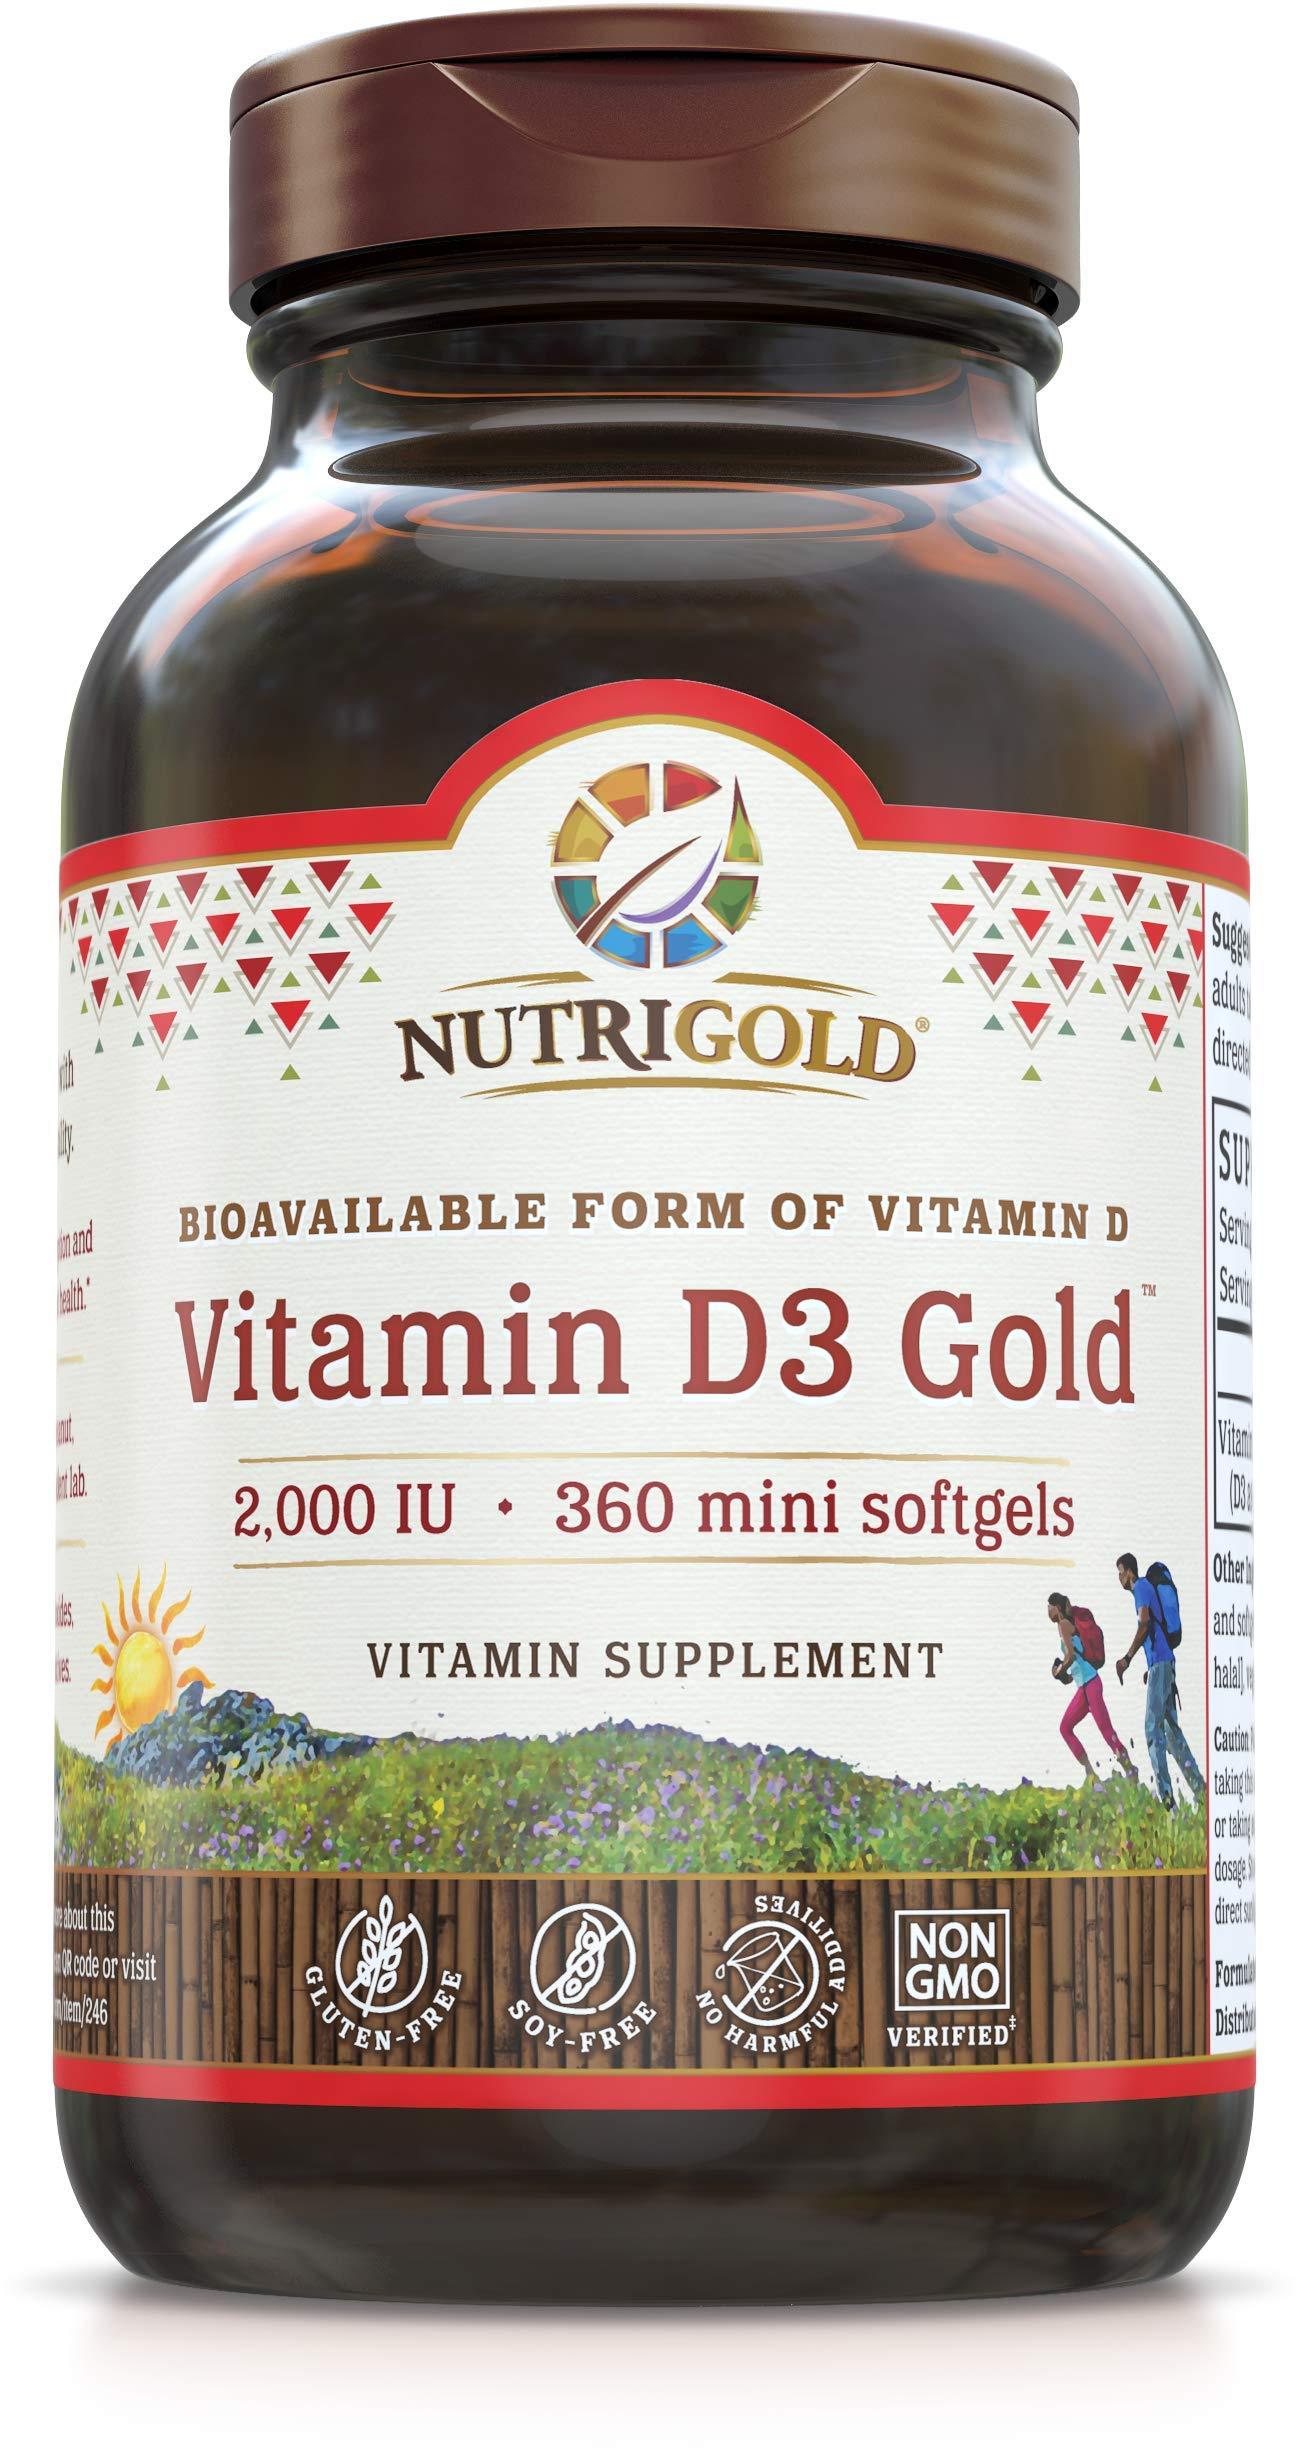 Nutrigold Vitamin D3 Gold (in Organic Olive Oil), 2000 IU, 360 softgels by Nutrigold